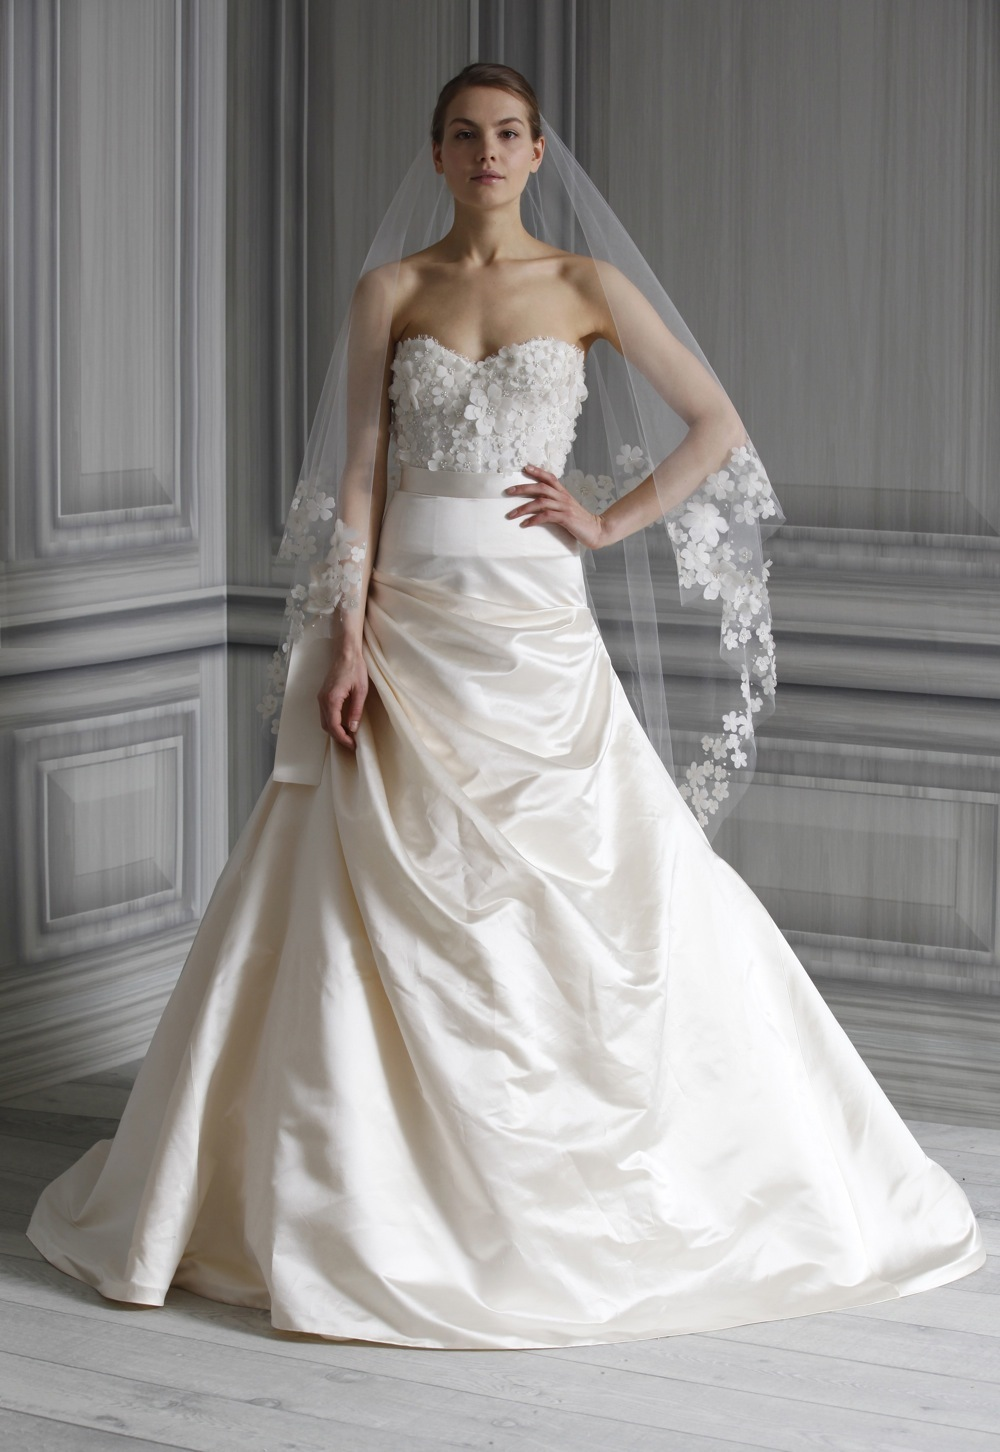 Wedding-dress-monique-lhuillier-bridal-gowns-spring-2012-poppy.full